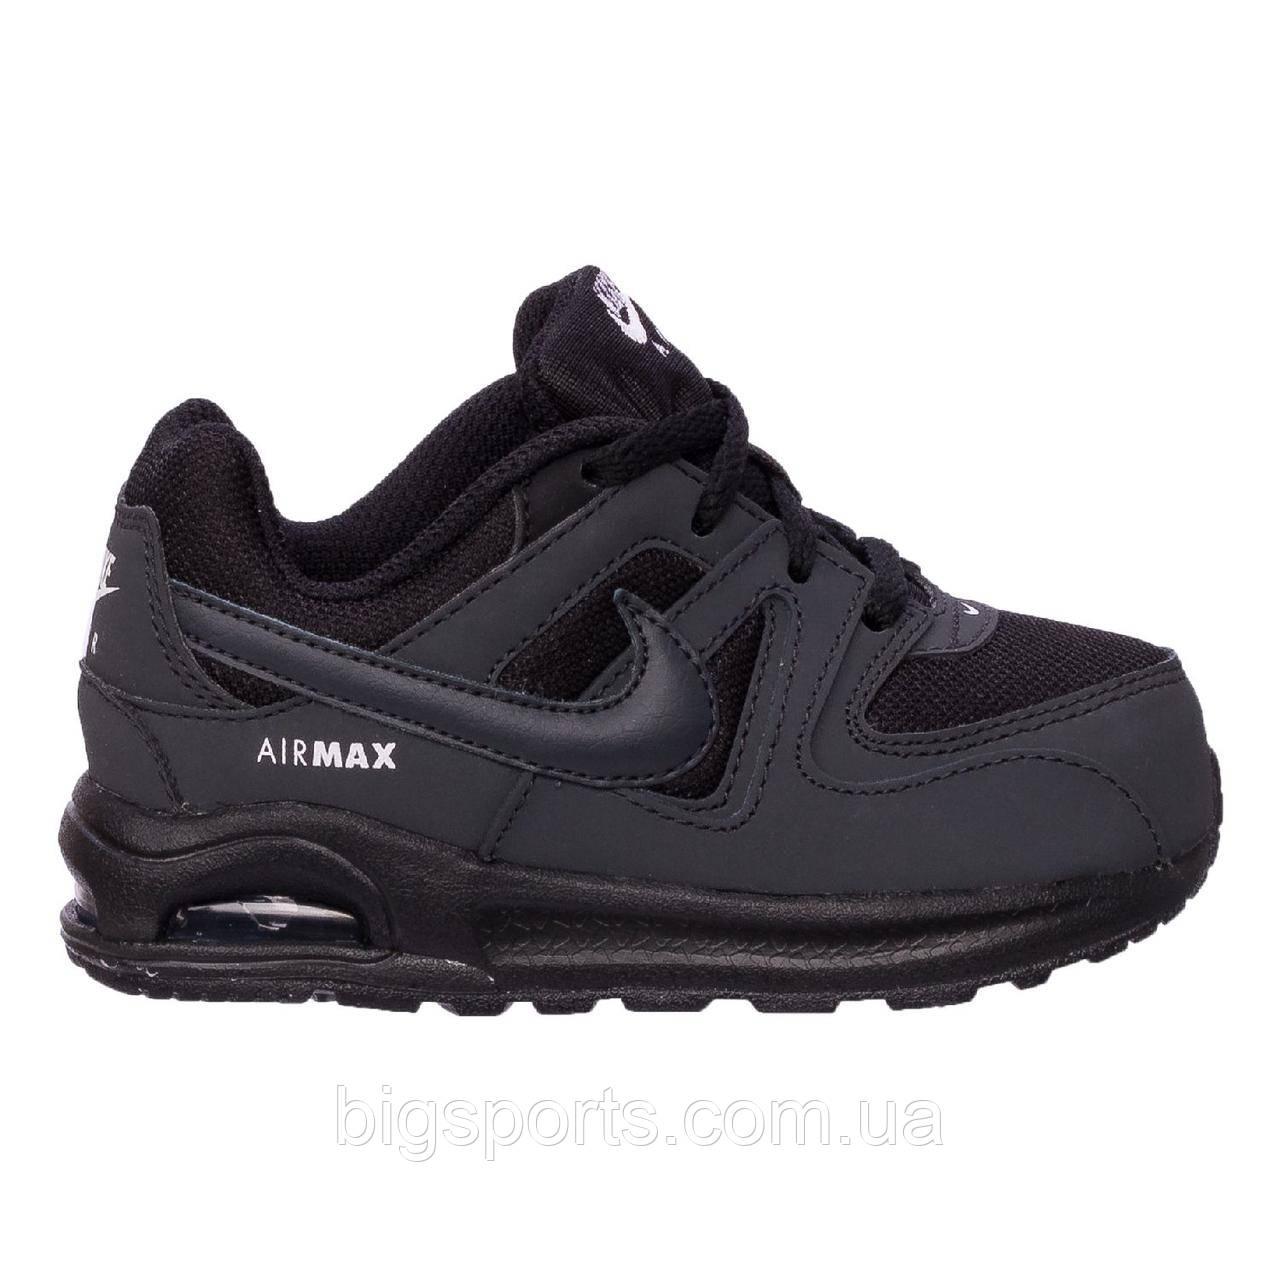 new product 11b59 e50ad Nike Air Max Command Flex TD (арт. 844348-002)